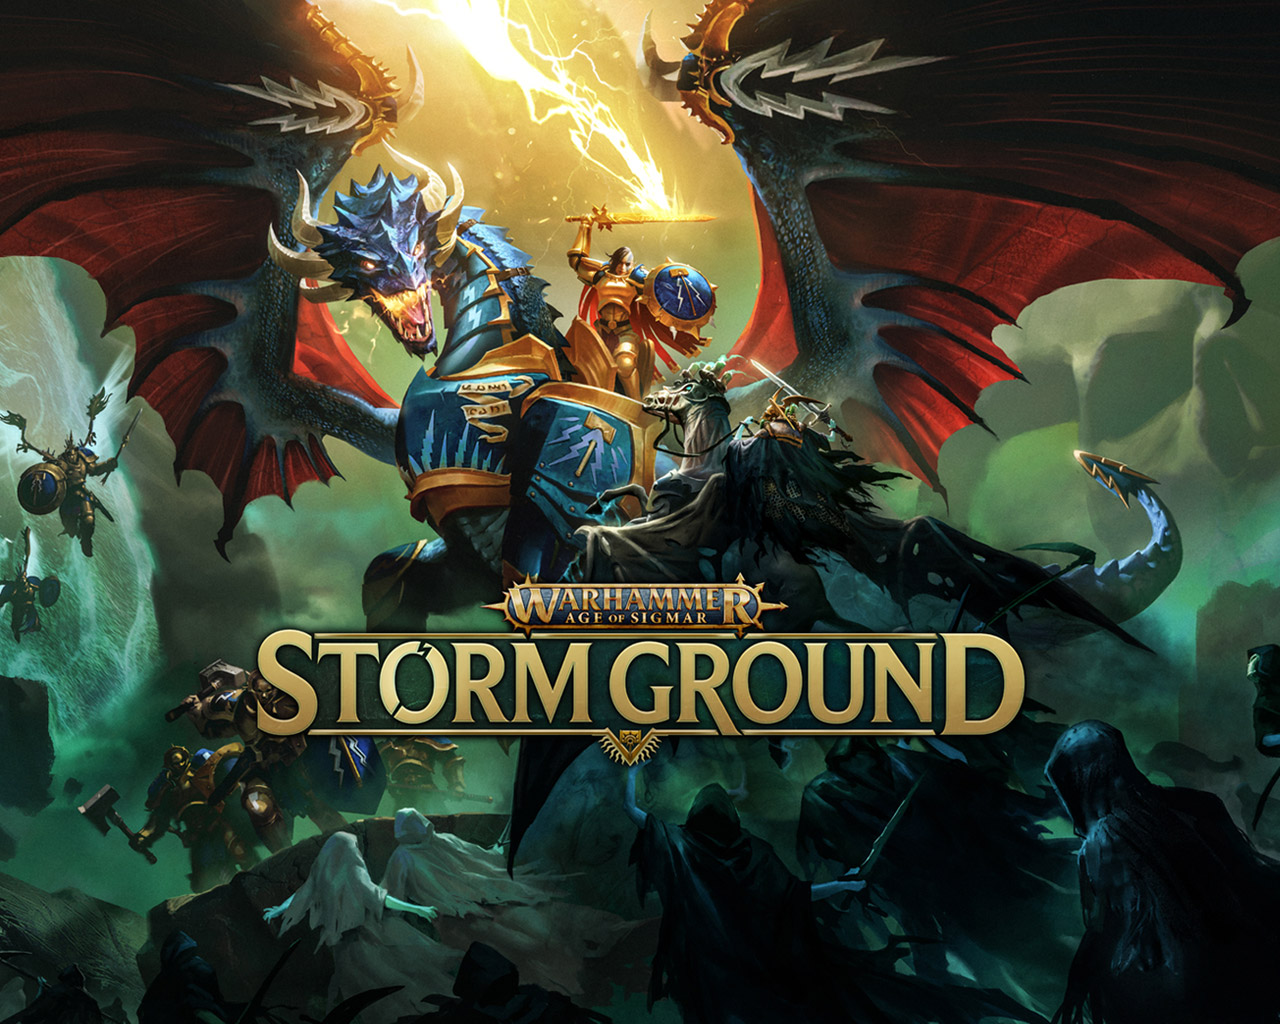 Free Warhammer Age of Sigmar: Storm Ground Wallpaper in 1280x1024